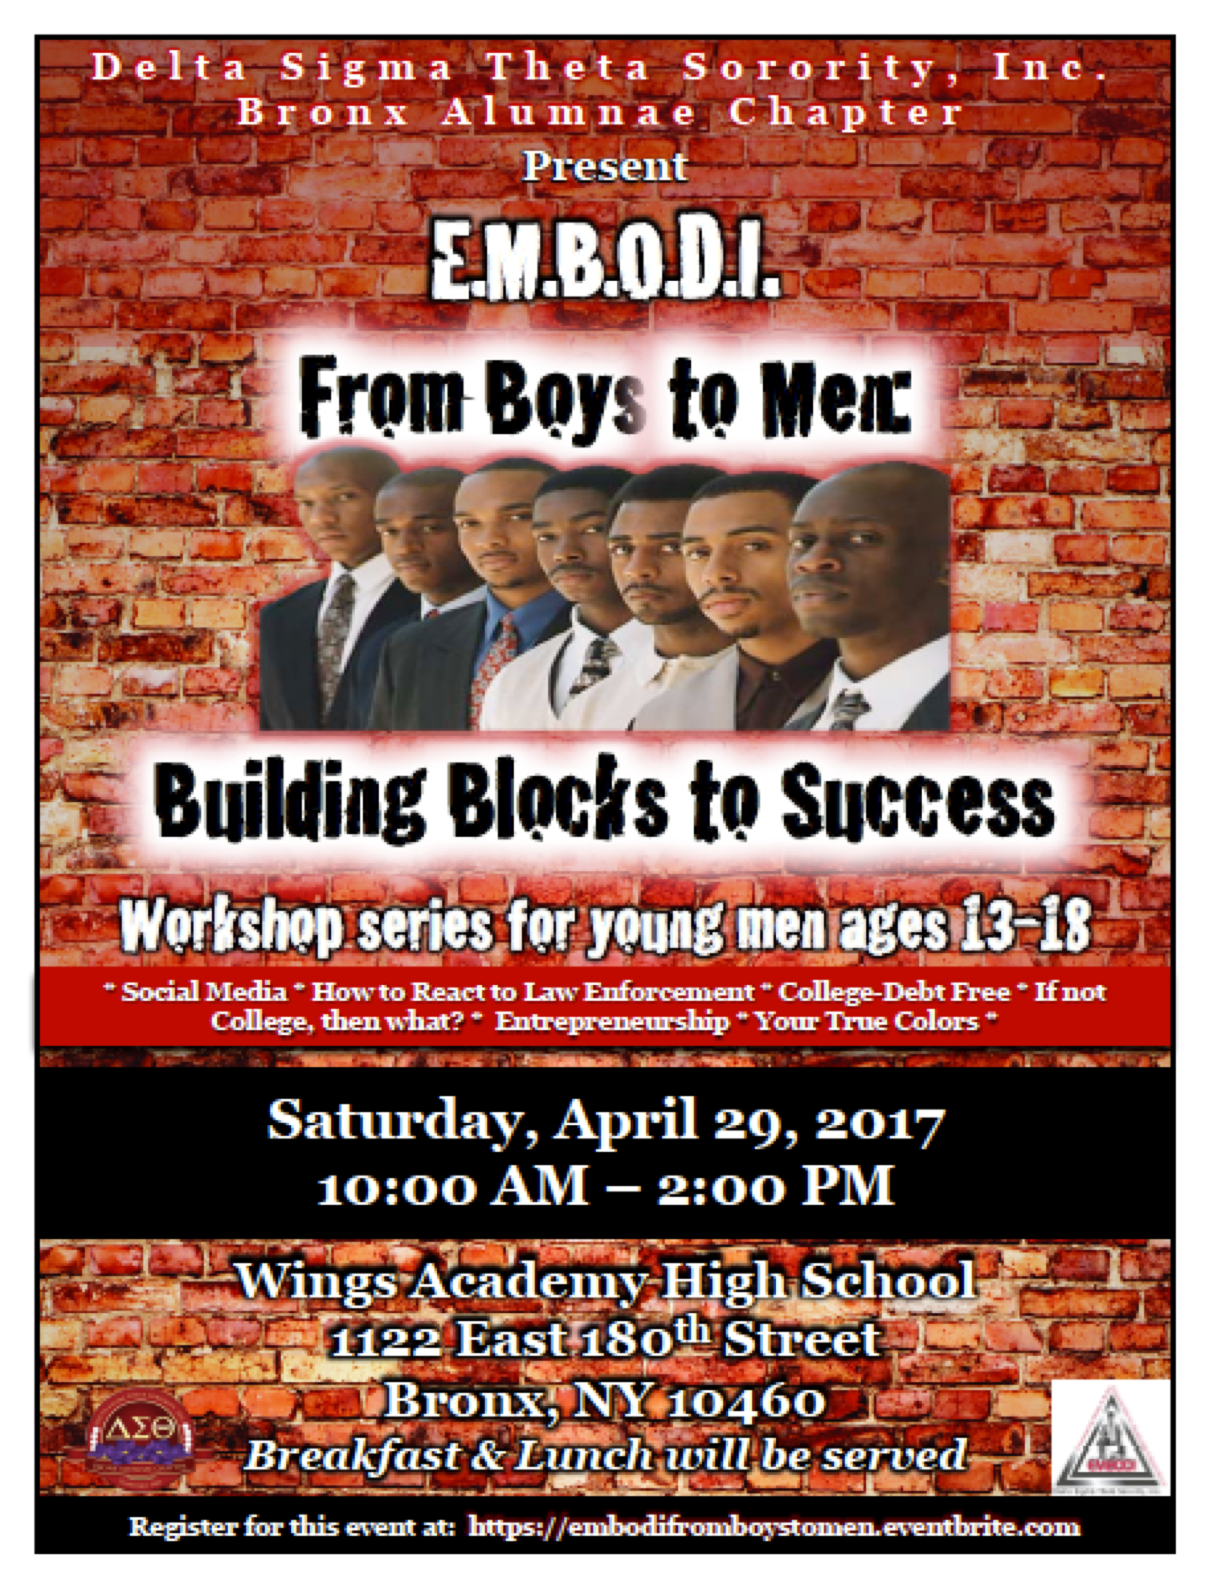 EMBODI-From Boys to Men: Building Blocks to S